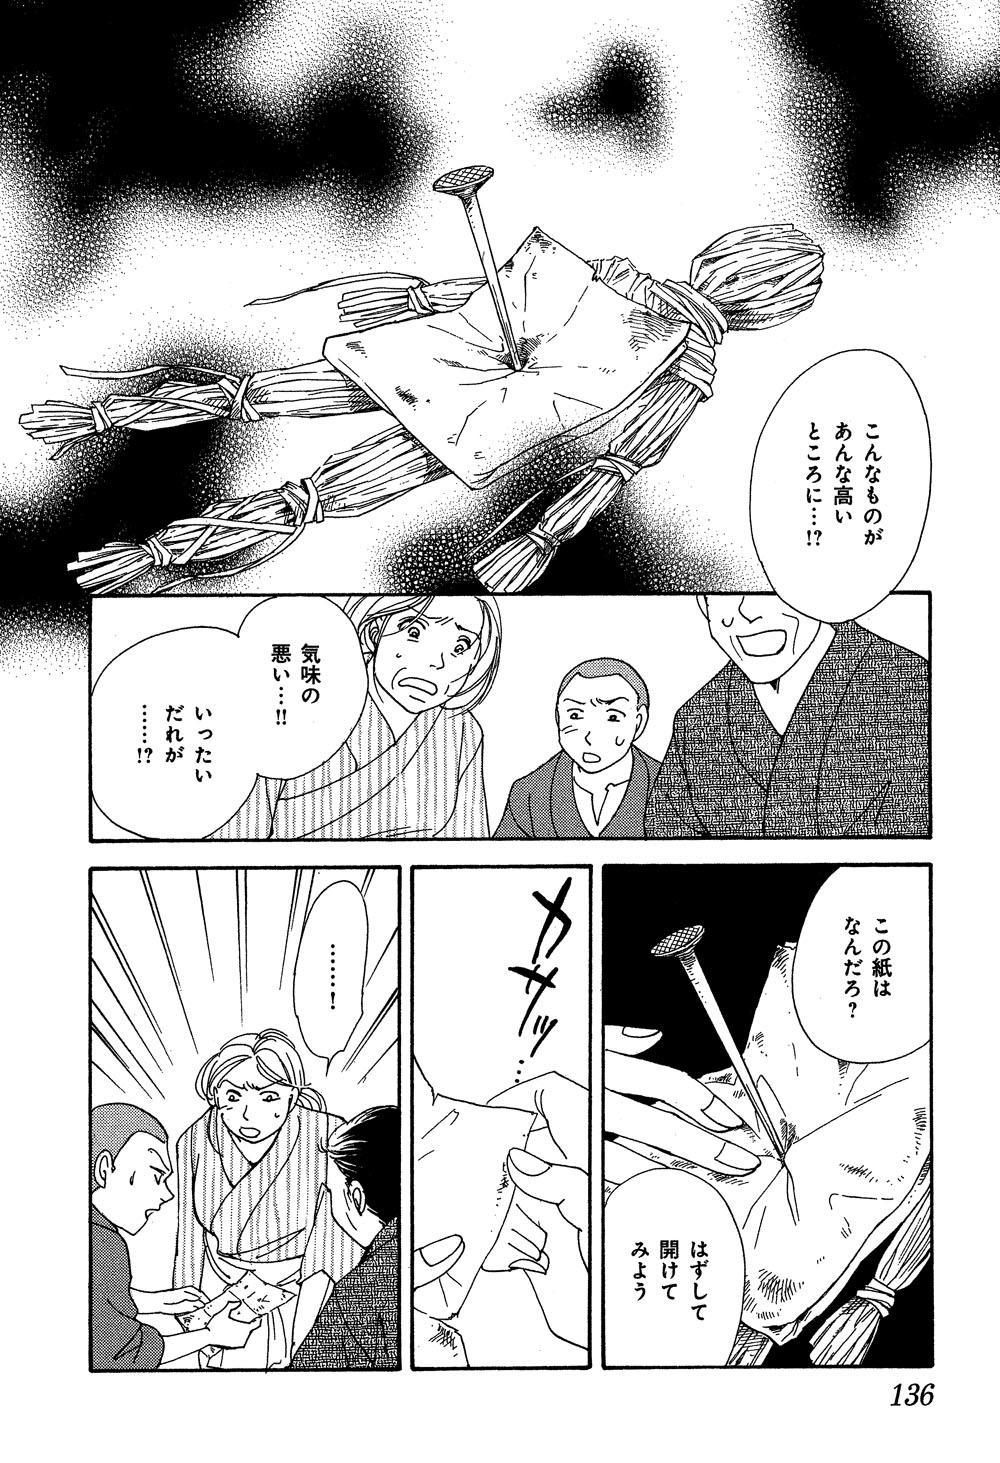 mayuri_0001_0136.jpg